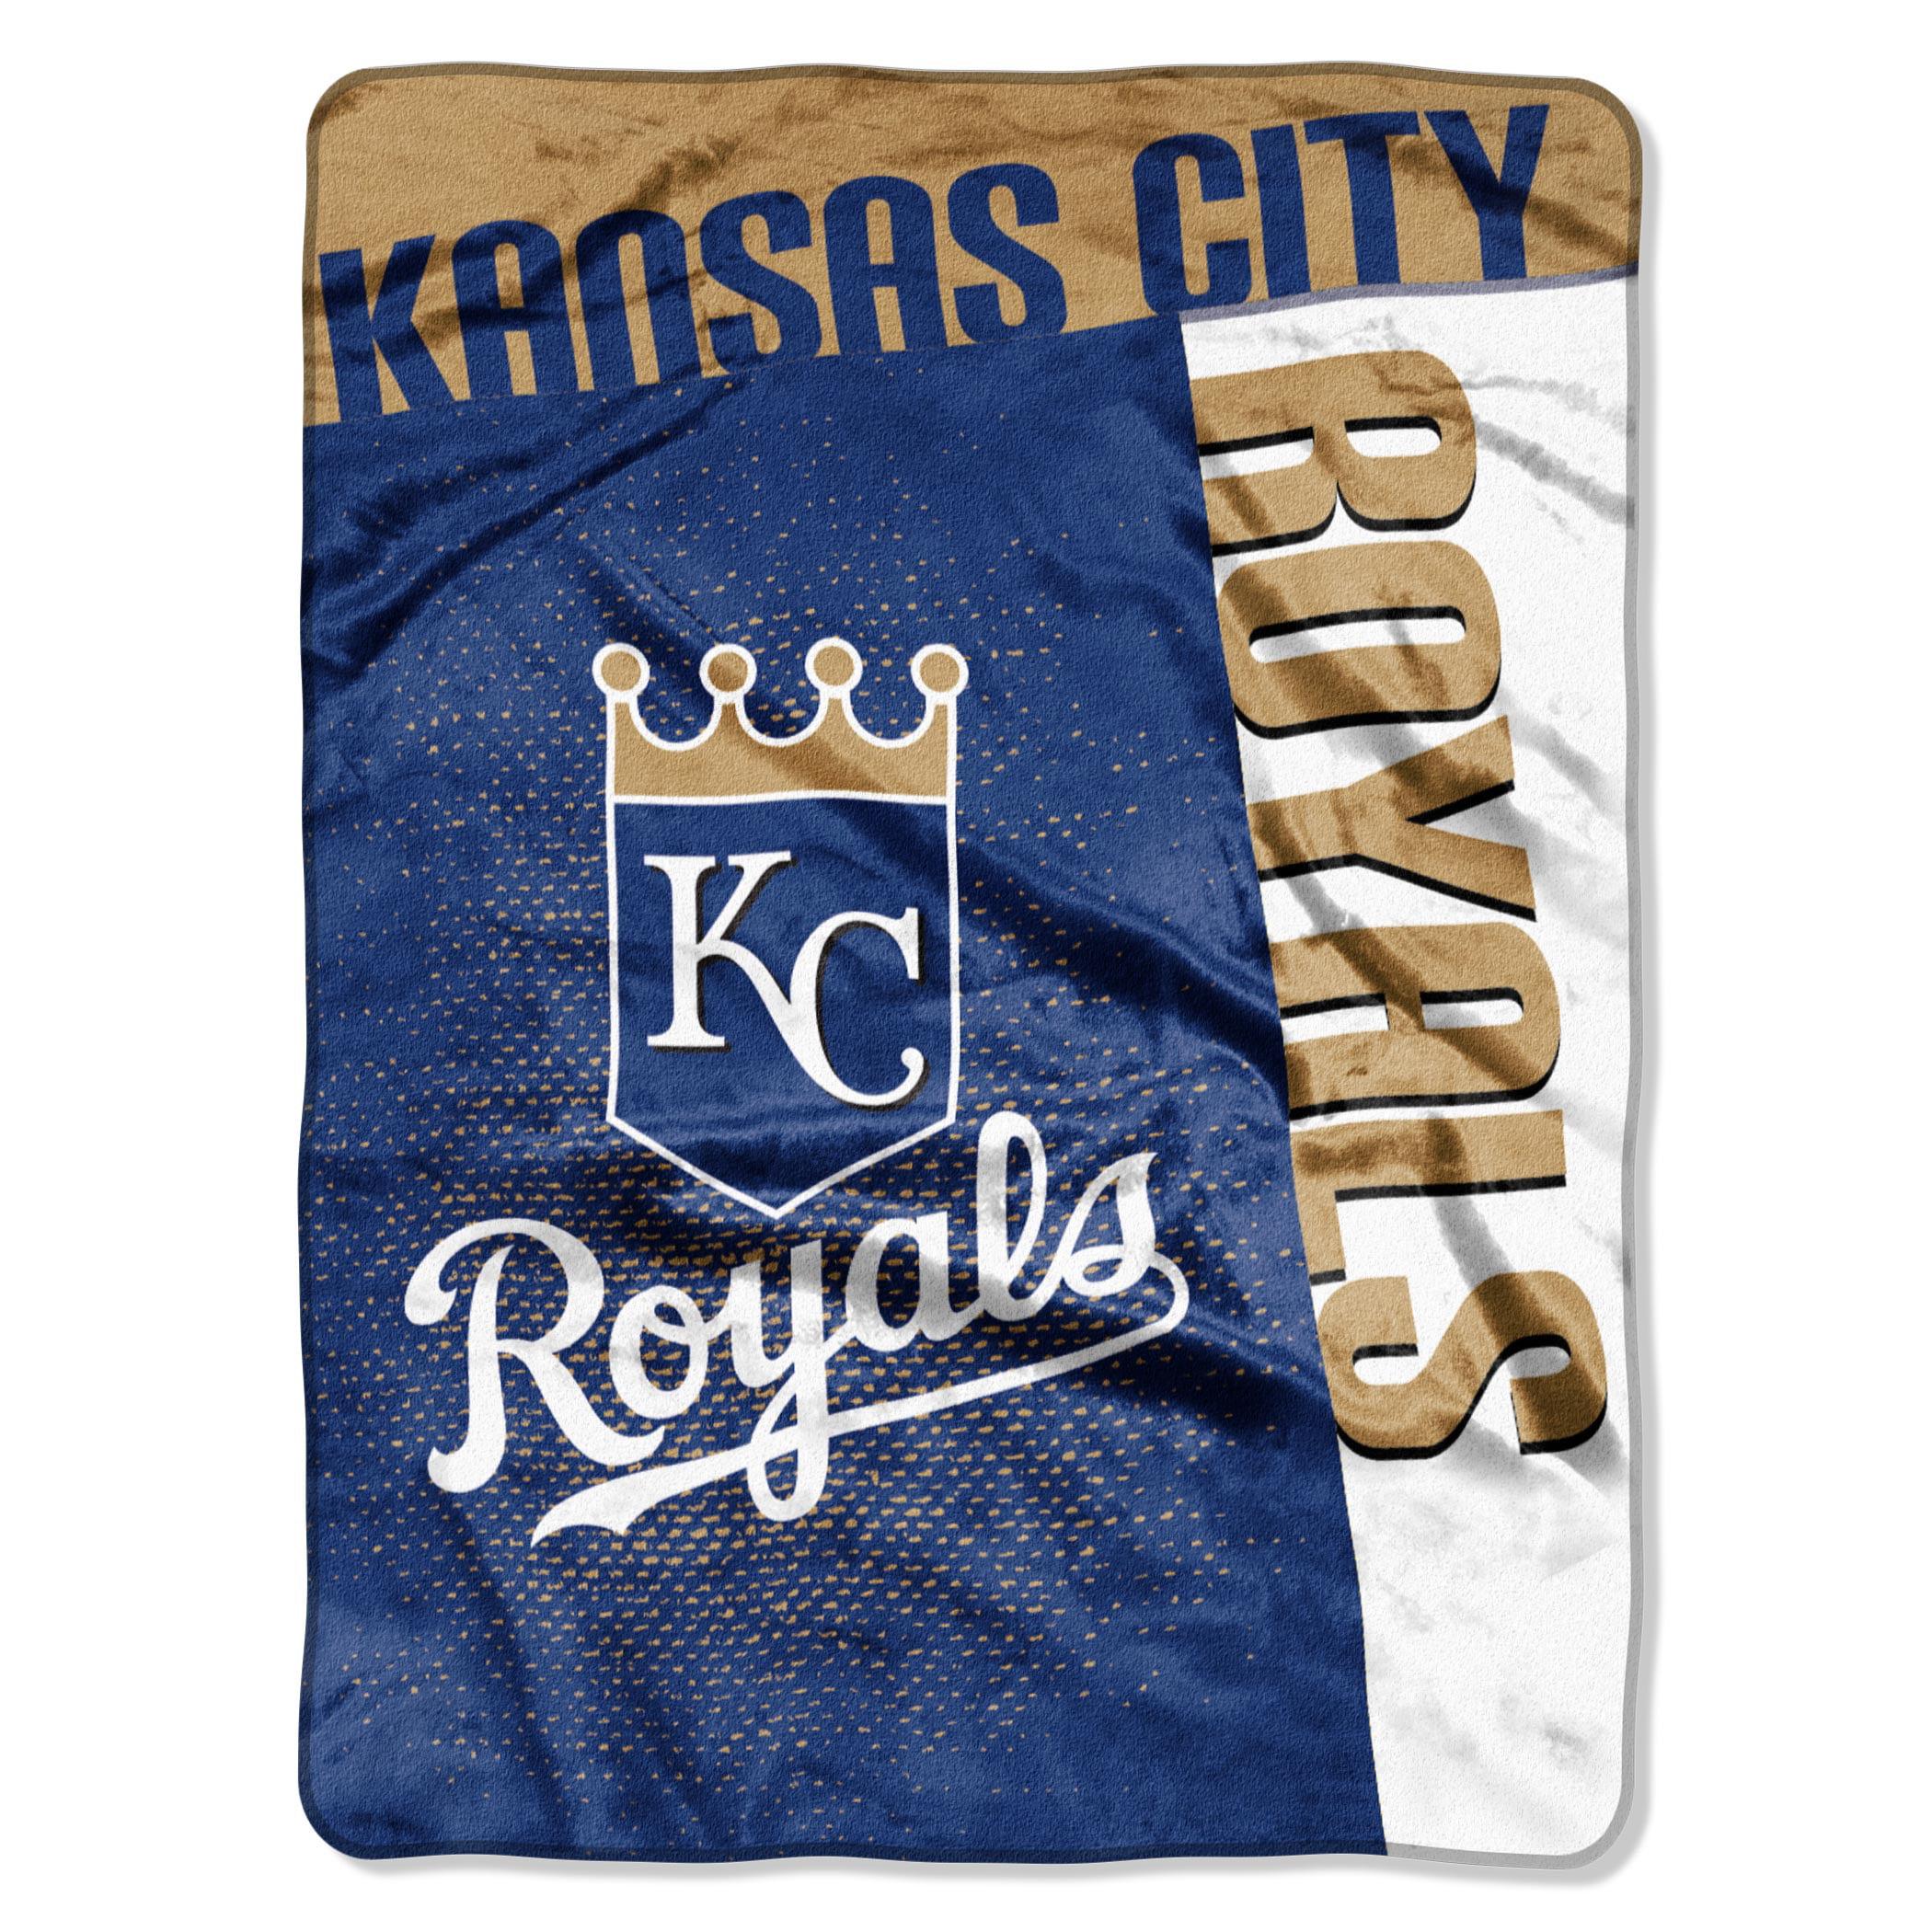 "Kansas City Royals 60"" x 80"" Strike Raschel Blanket - No Size"